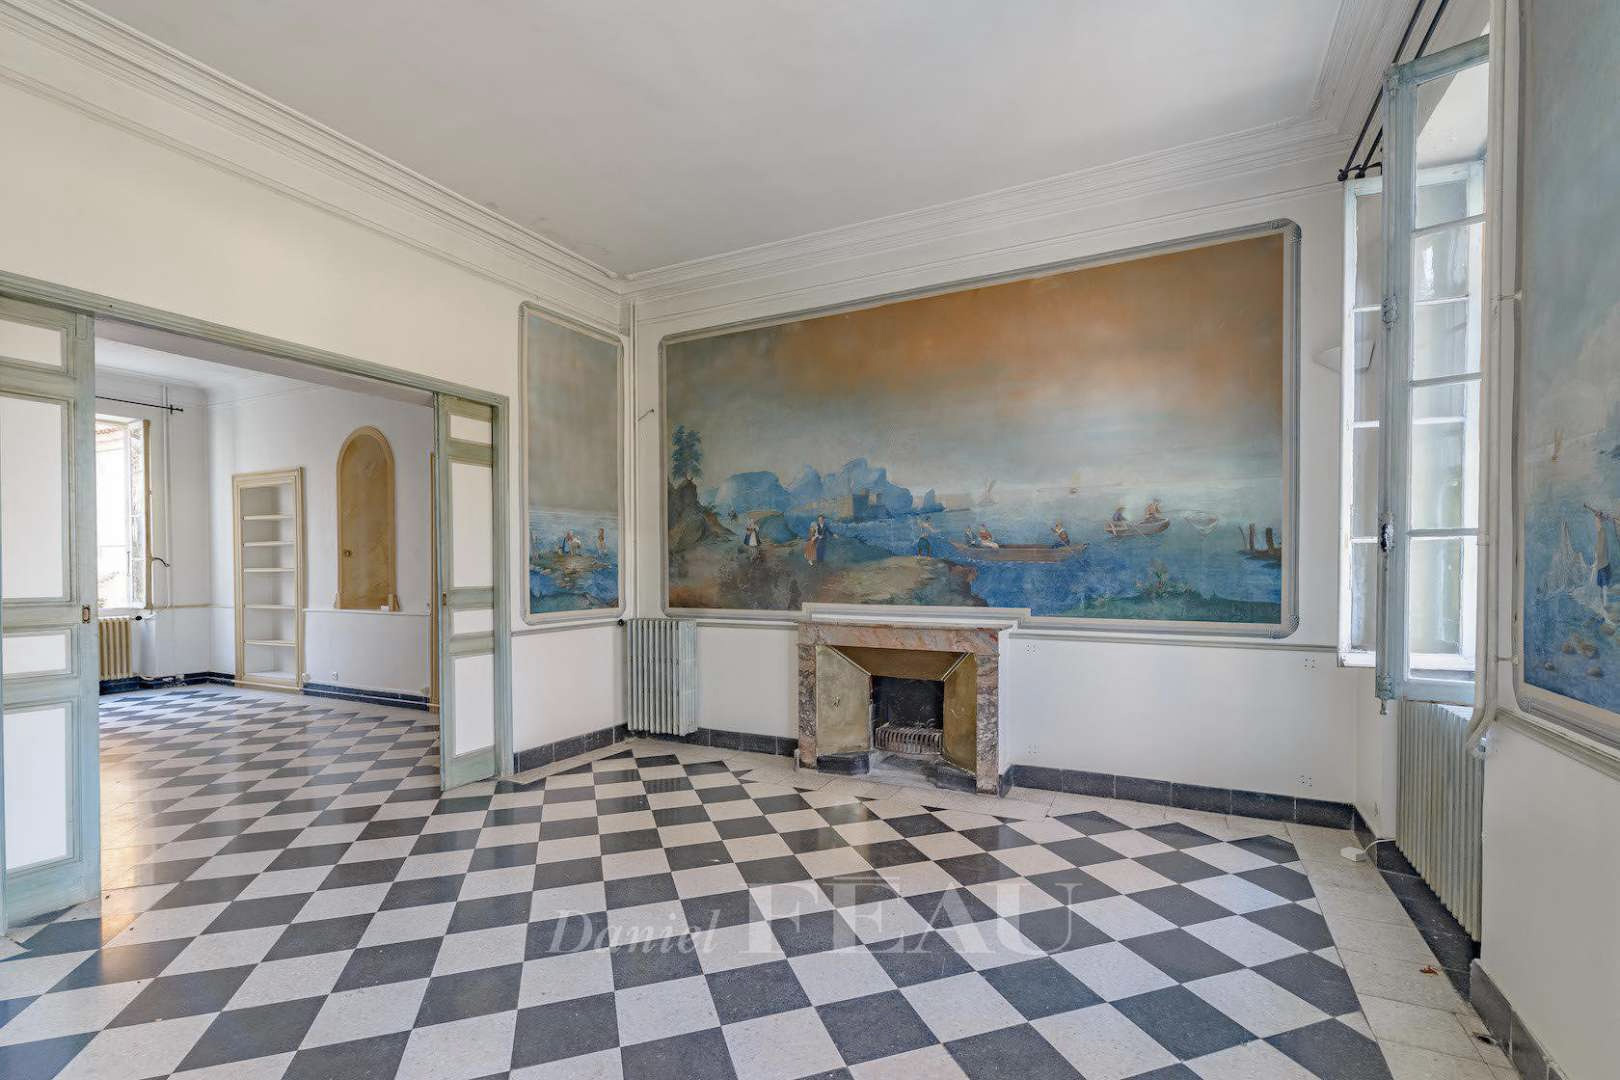 French Chateau for sale via Daniel Feau